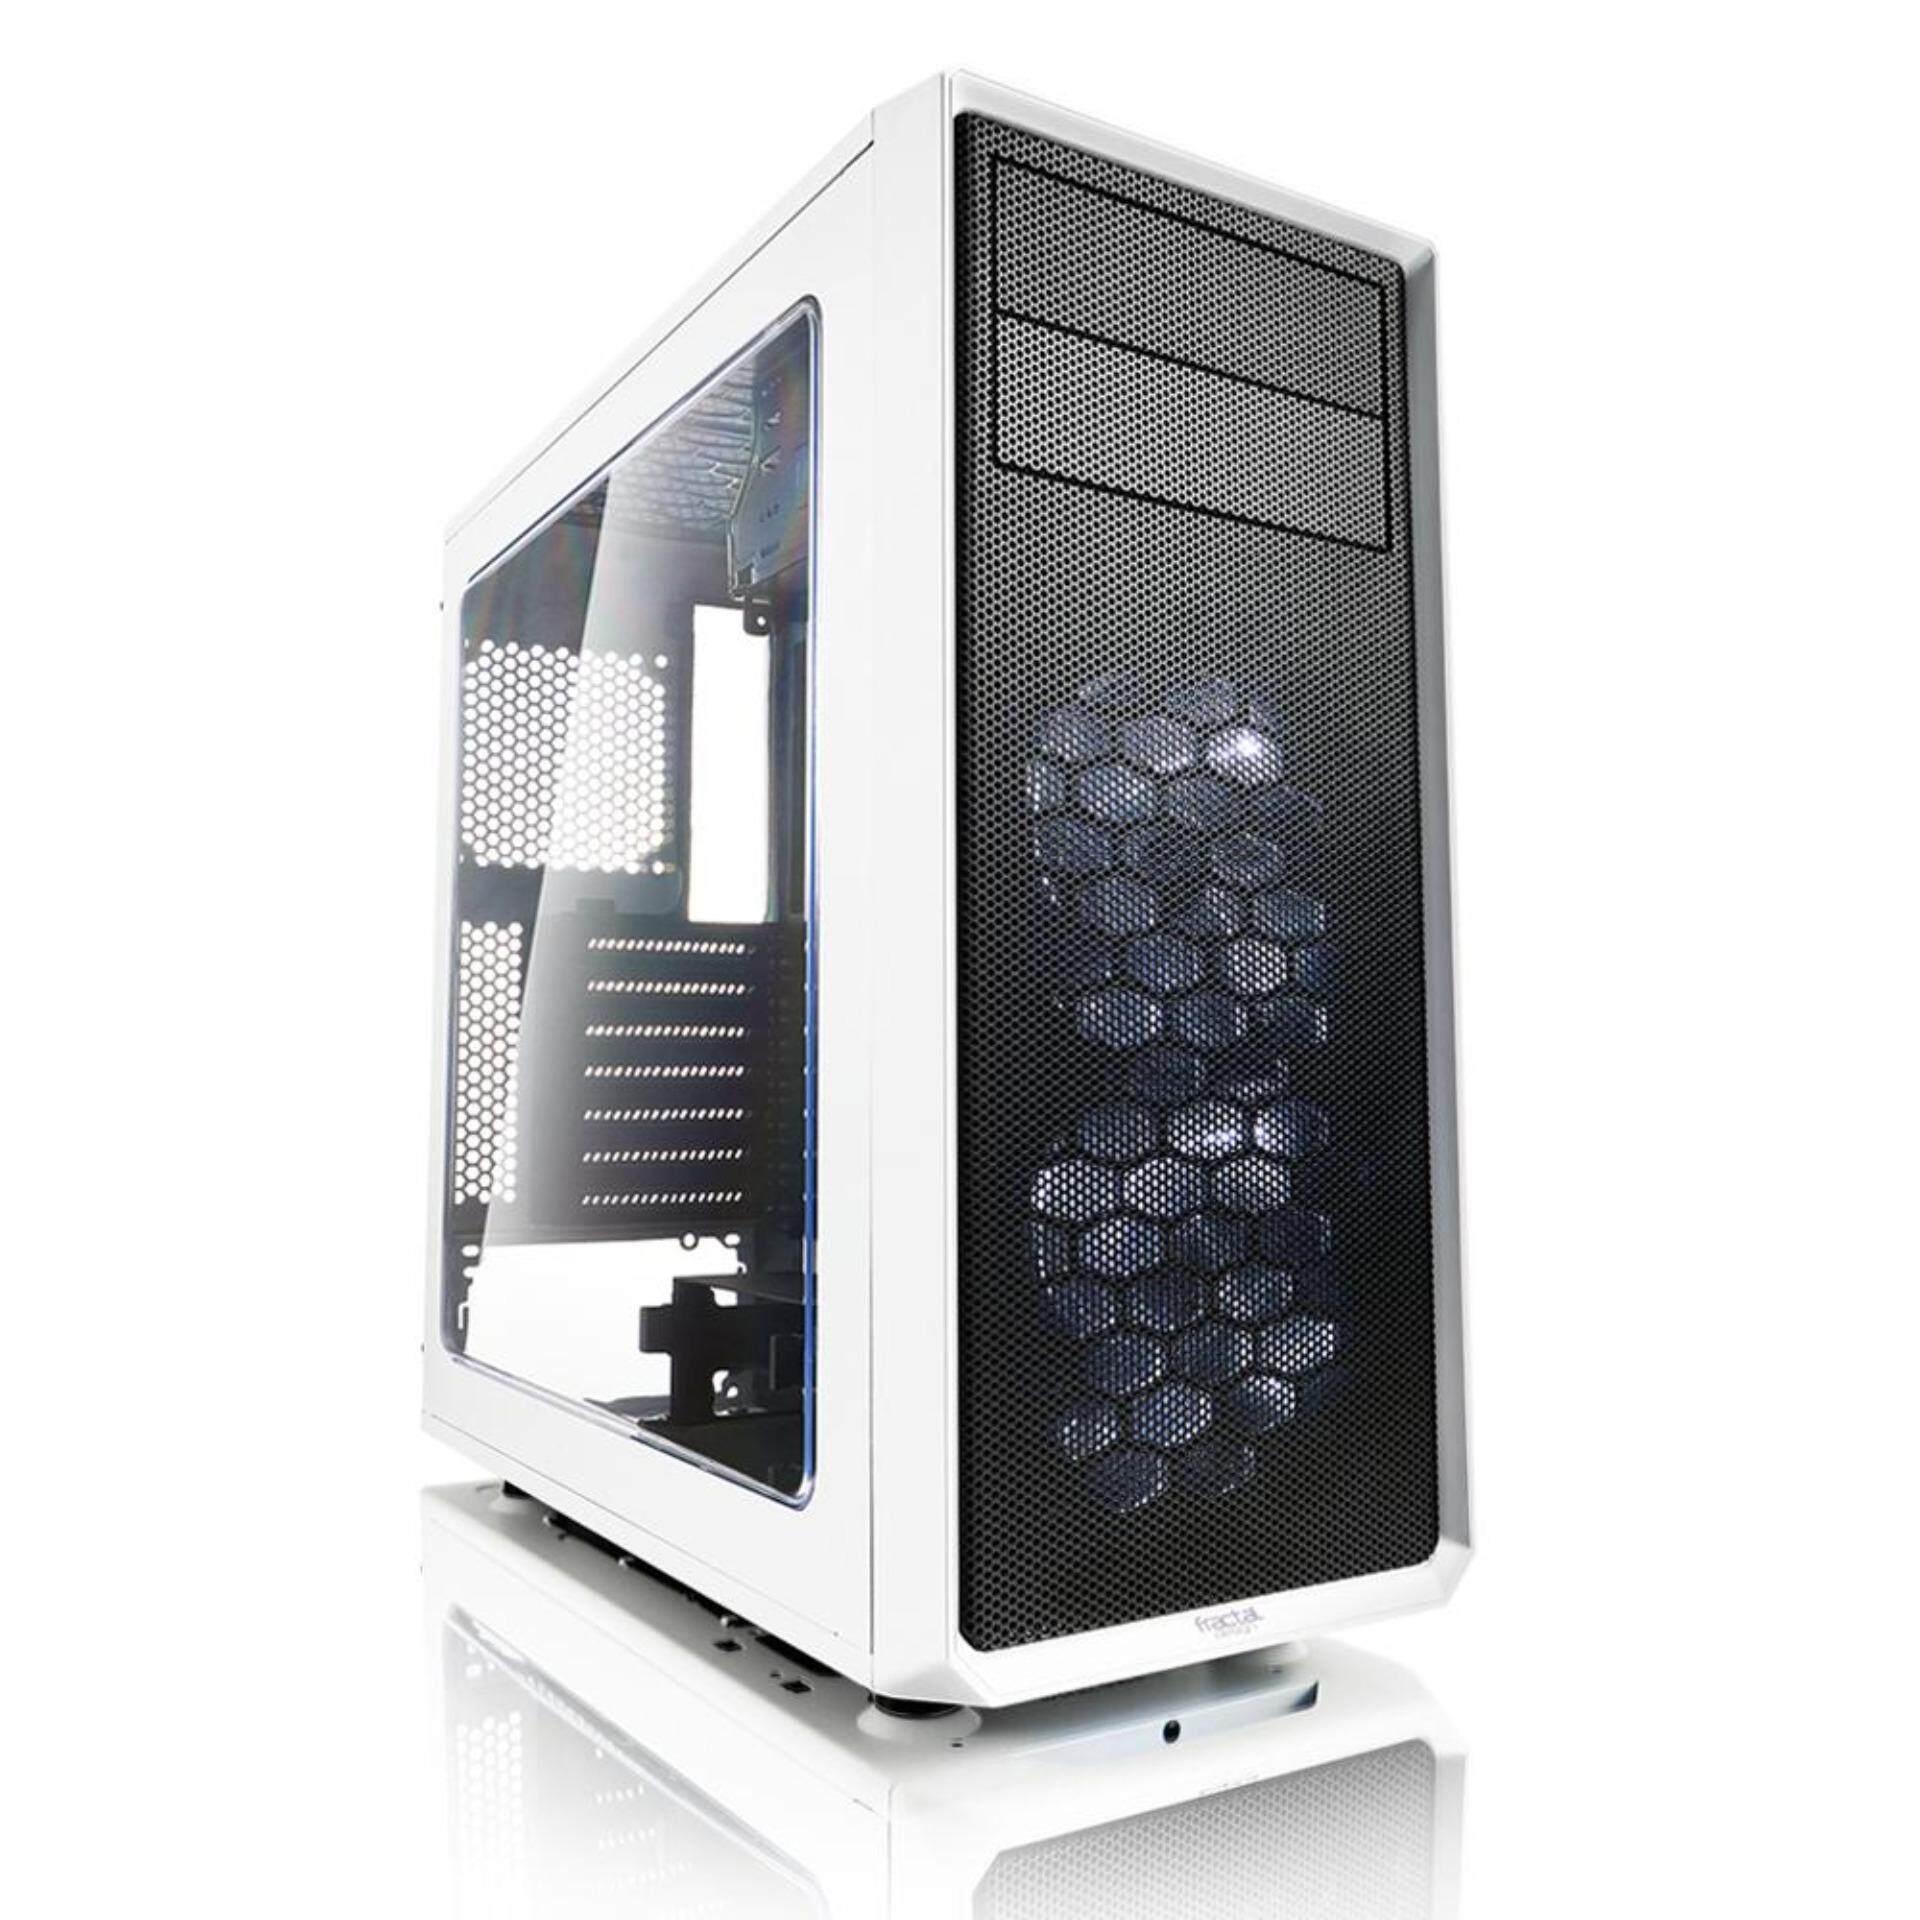 GAMING CASE - Intel® Core™ i7-8700 RAM 8GB GTX 1050 (GEN8)